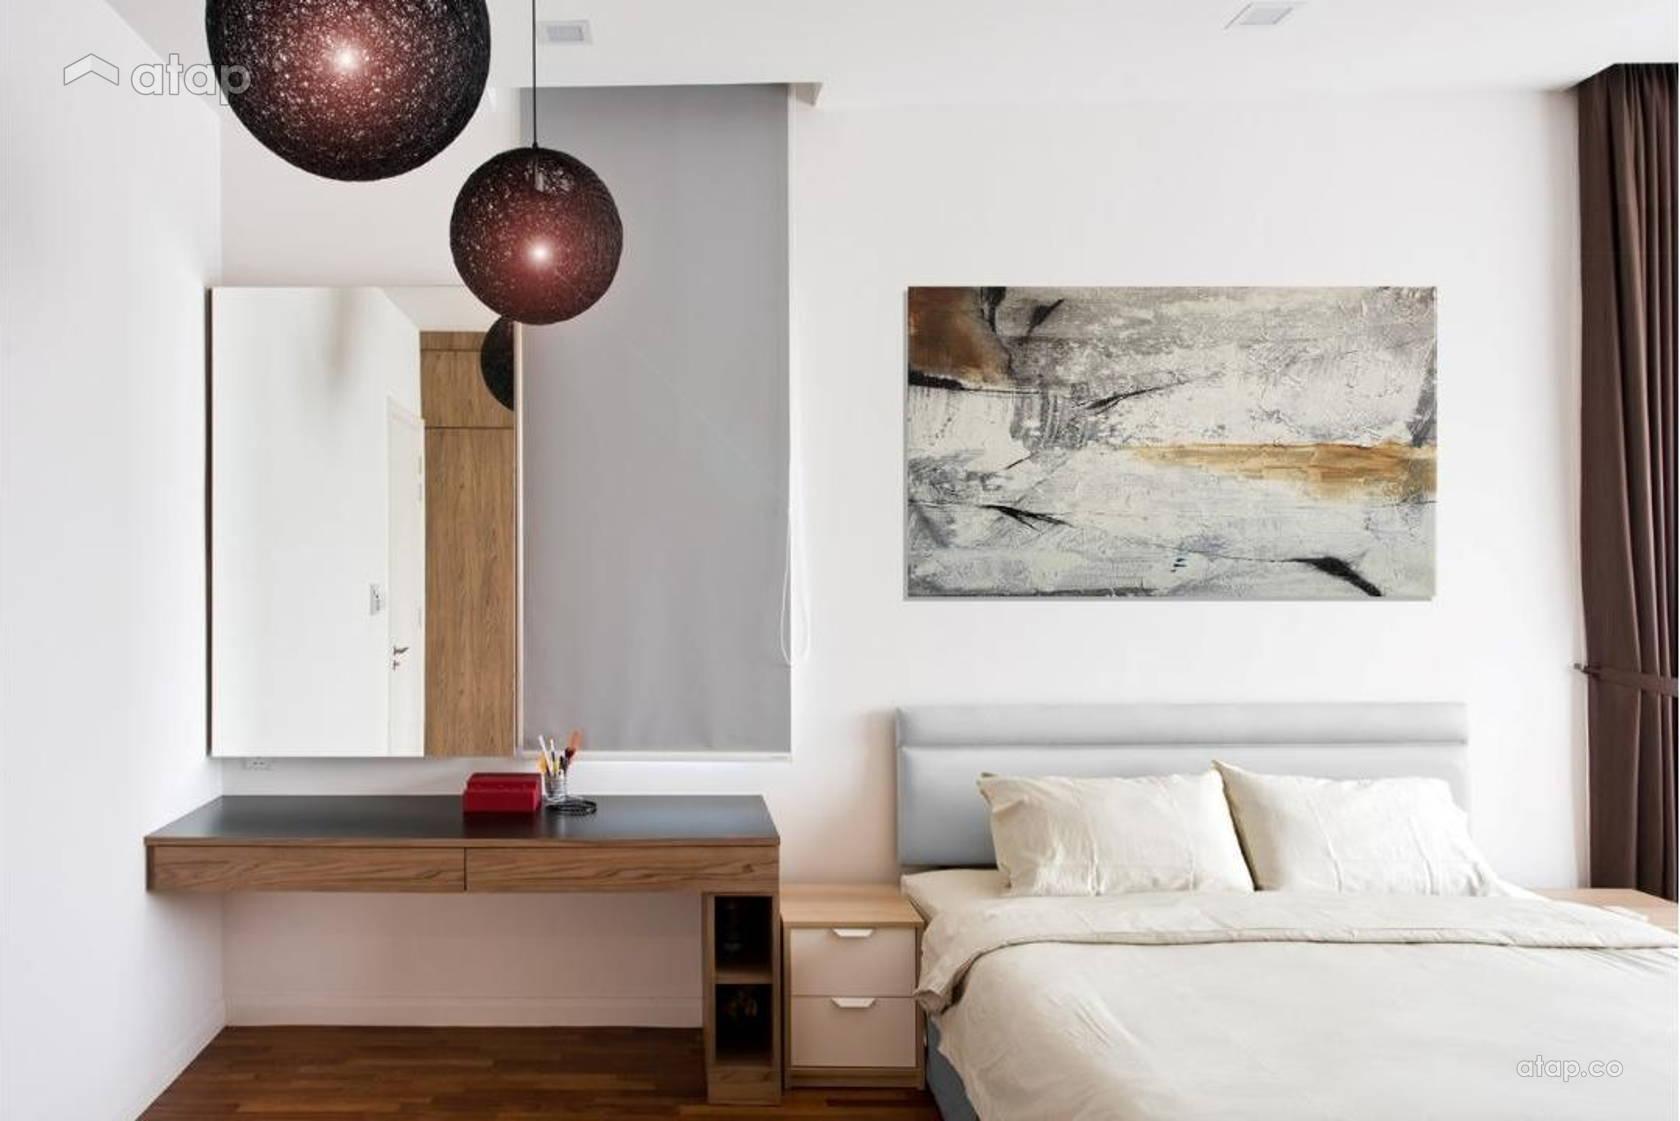 setia eco glades cyberjaya interior design renovation ideas 1 16